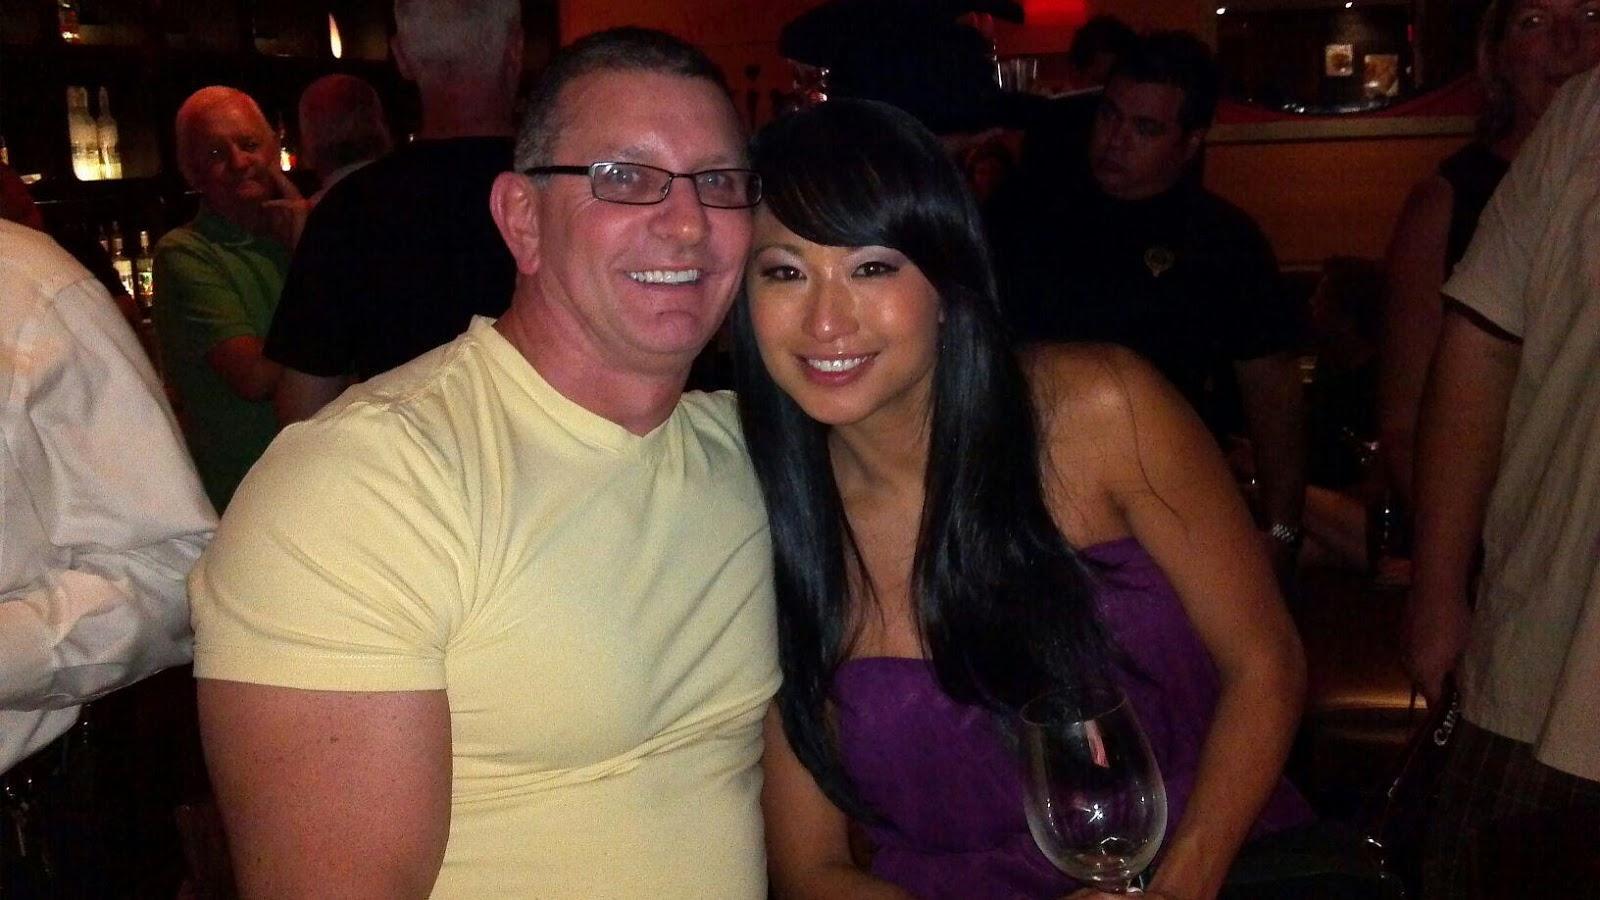 Gail Kim Hot Images wrestling super stars: gail kim with husband new hot photos 2013